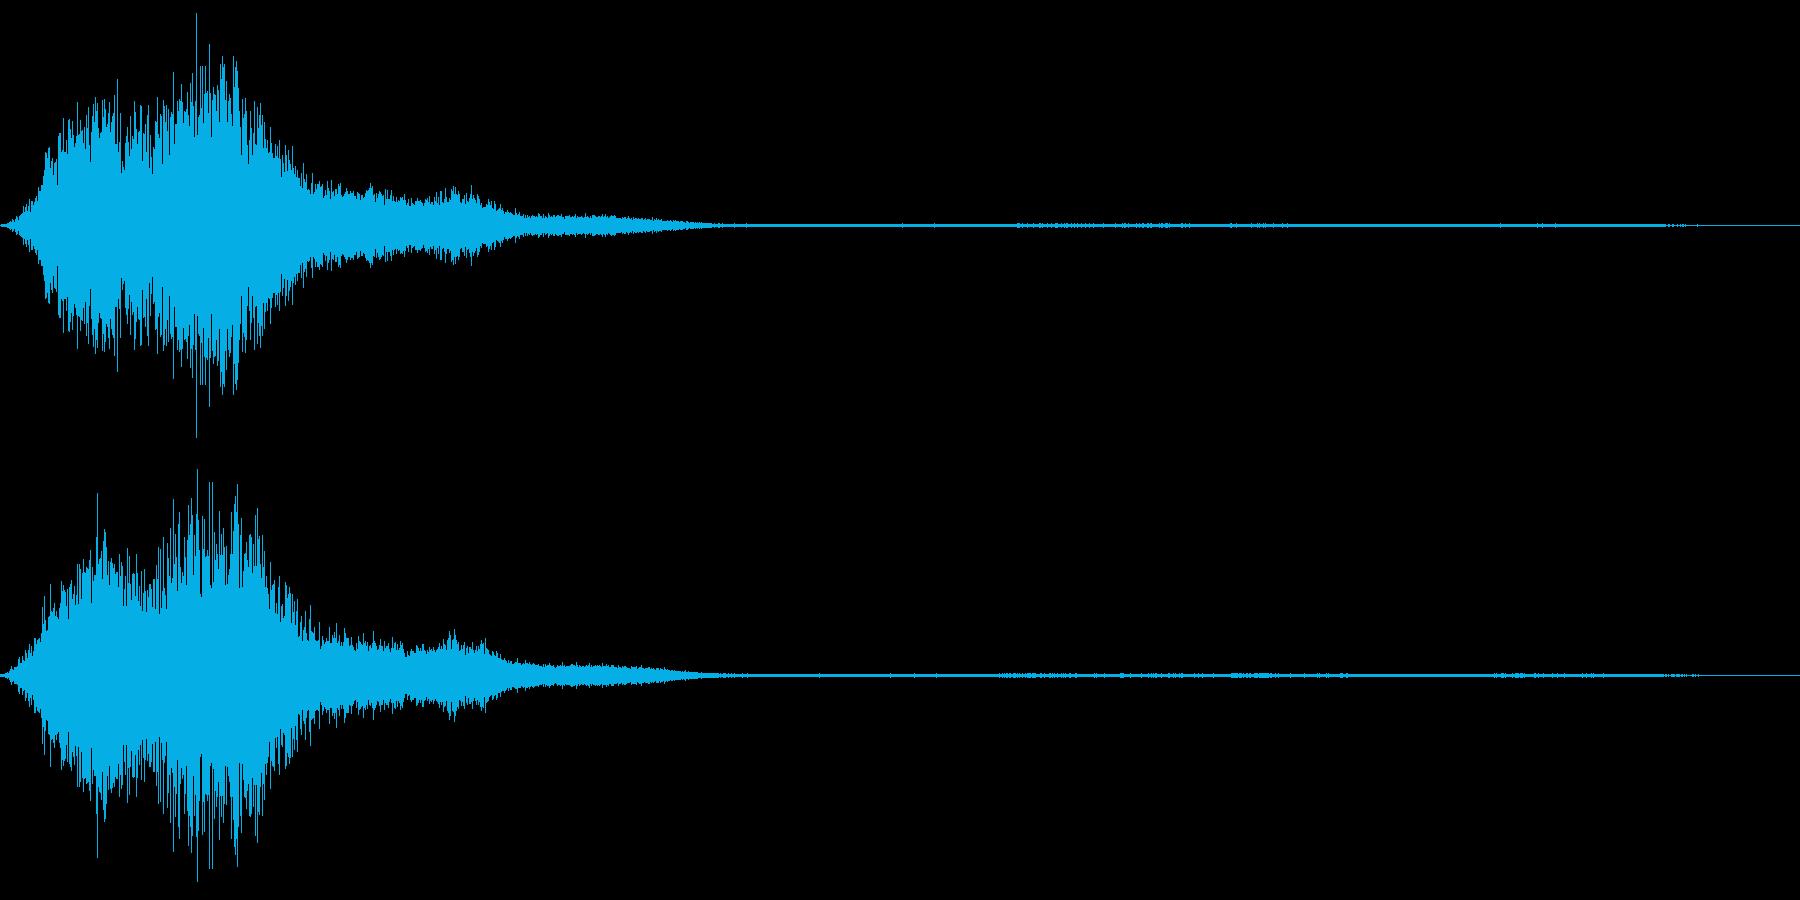 CINEMATIC DARK HELLの再生済みの波形